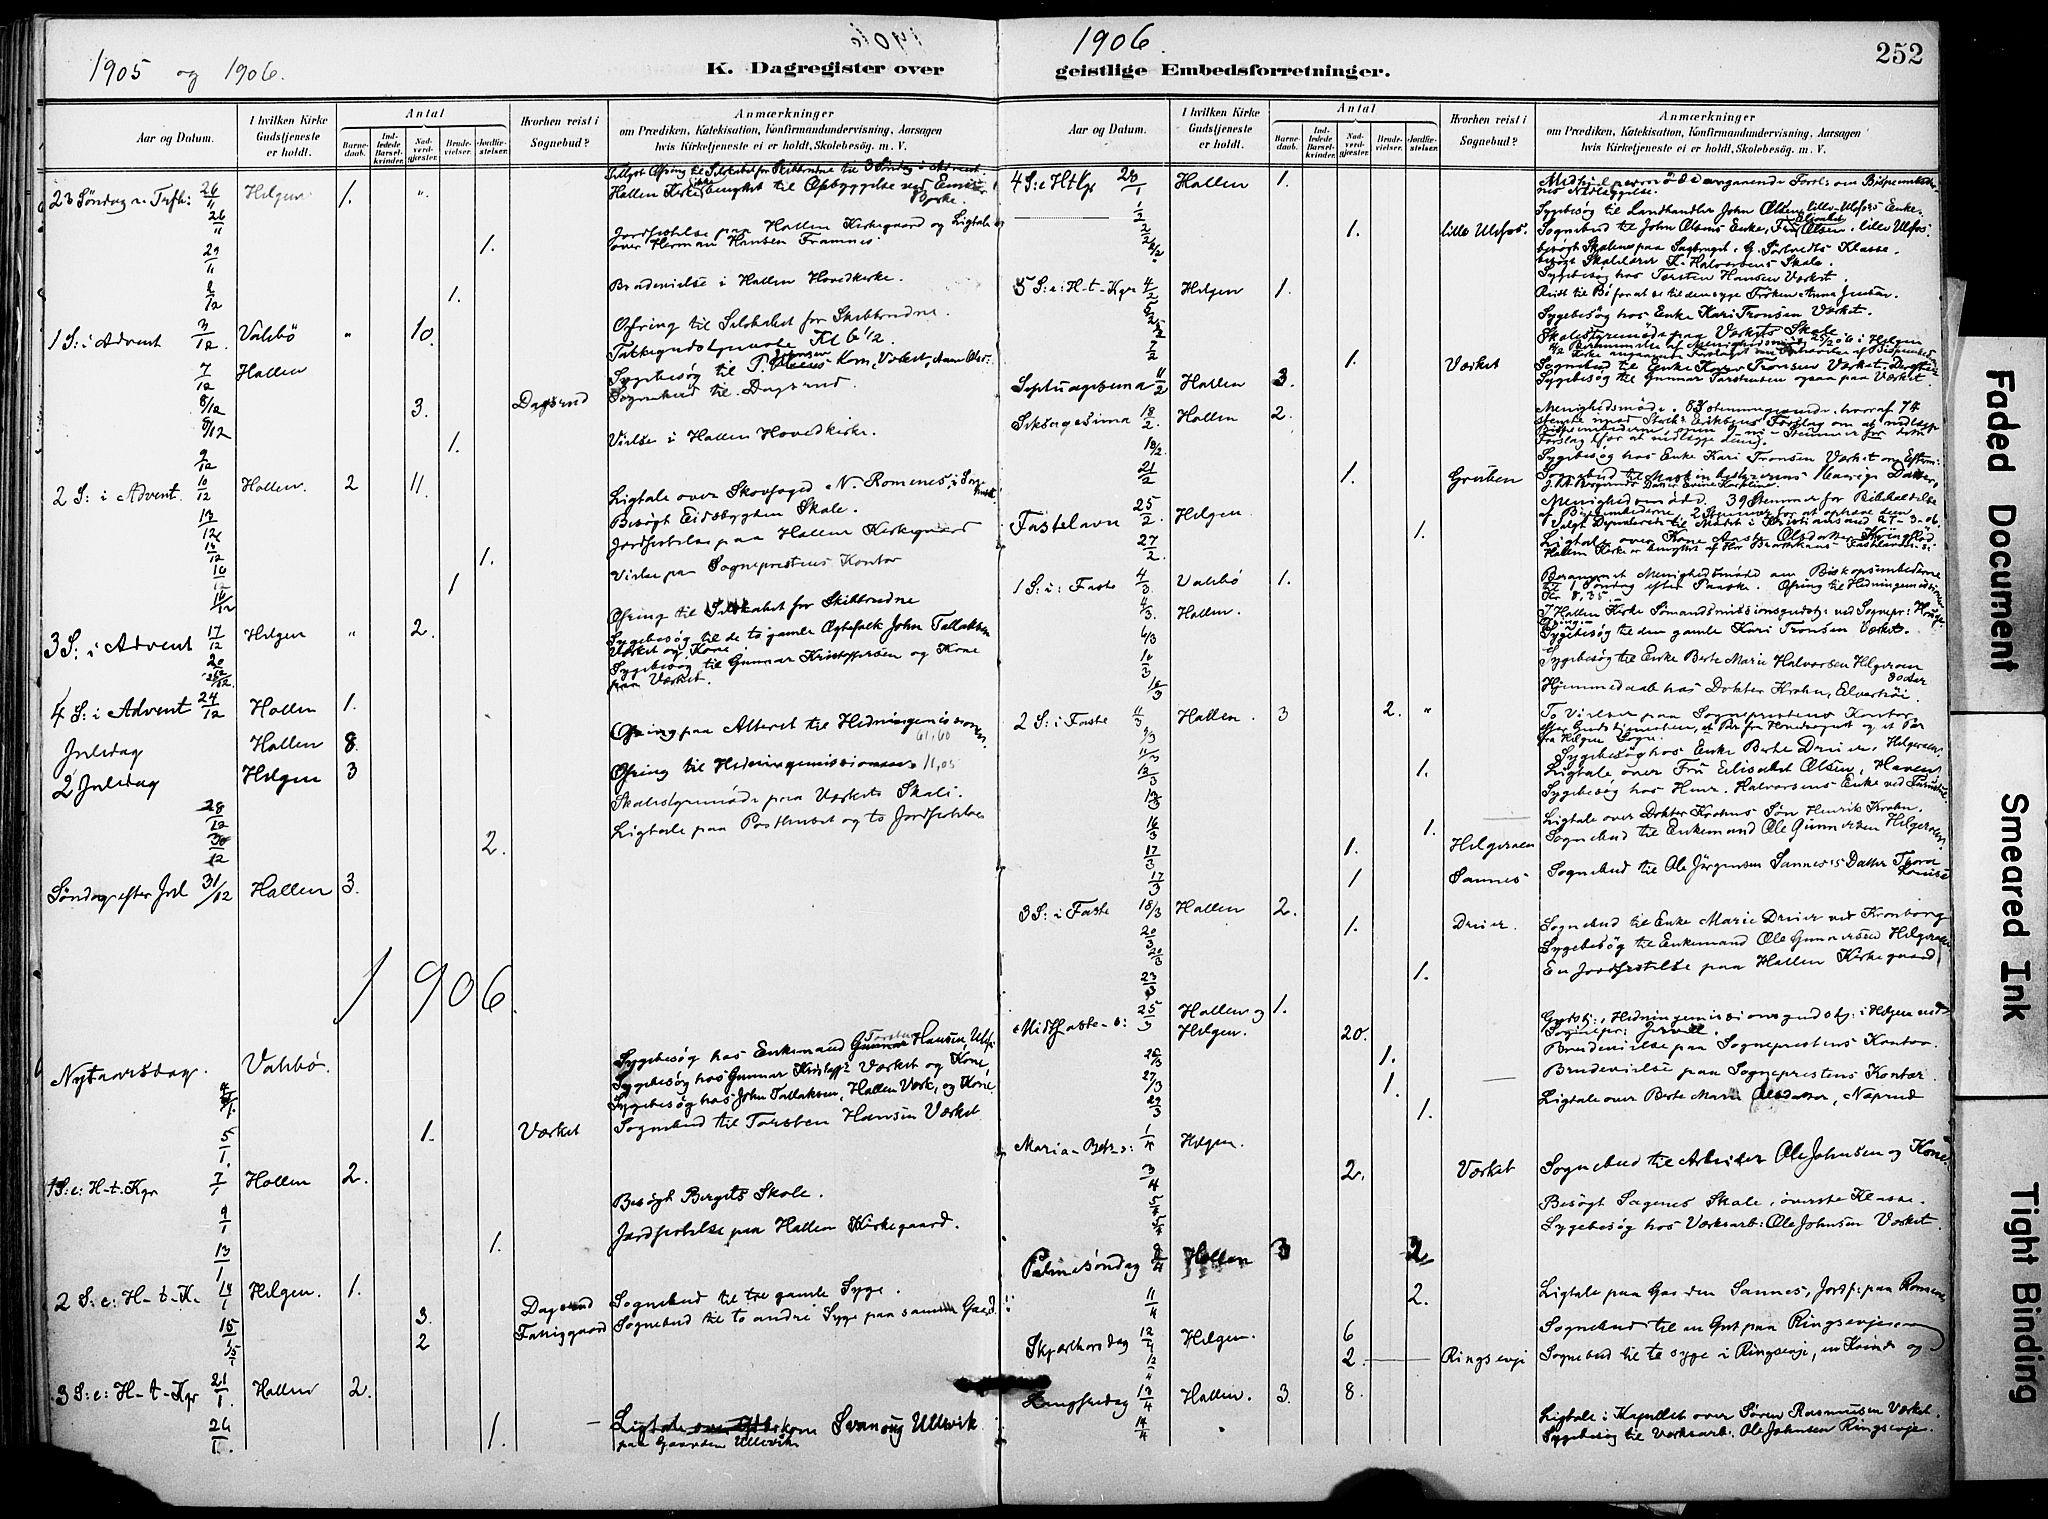 SAKO, Holla kirkebøker, F/Fa/L0010: Ministerialbok nr. 10, 1897-1907, s. 252